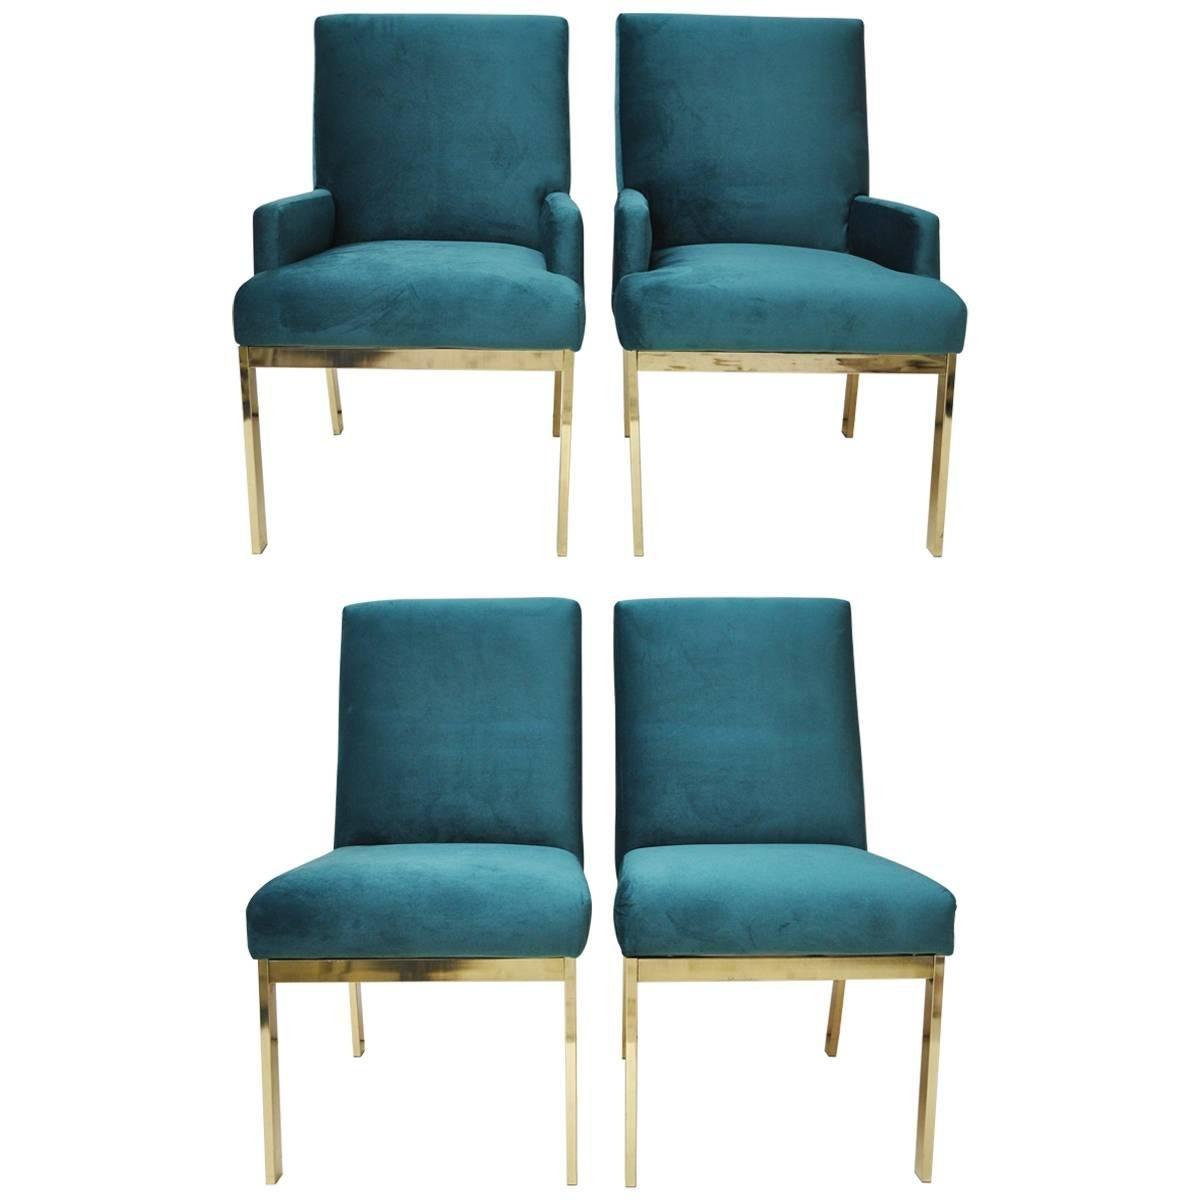 zoom image 007 dining chair industrial midcentury modern art